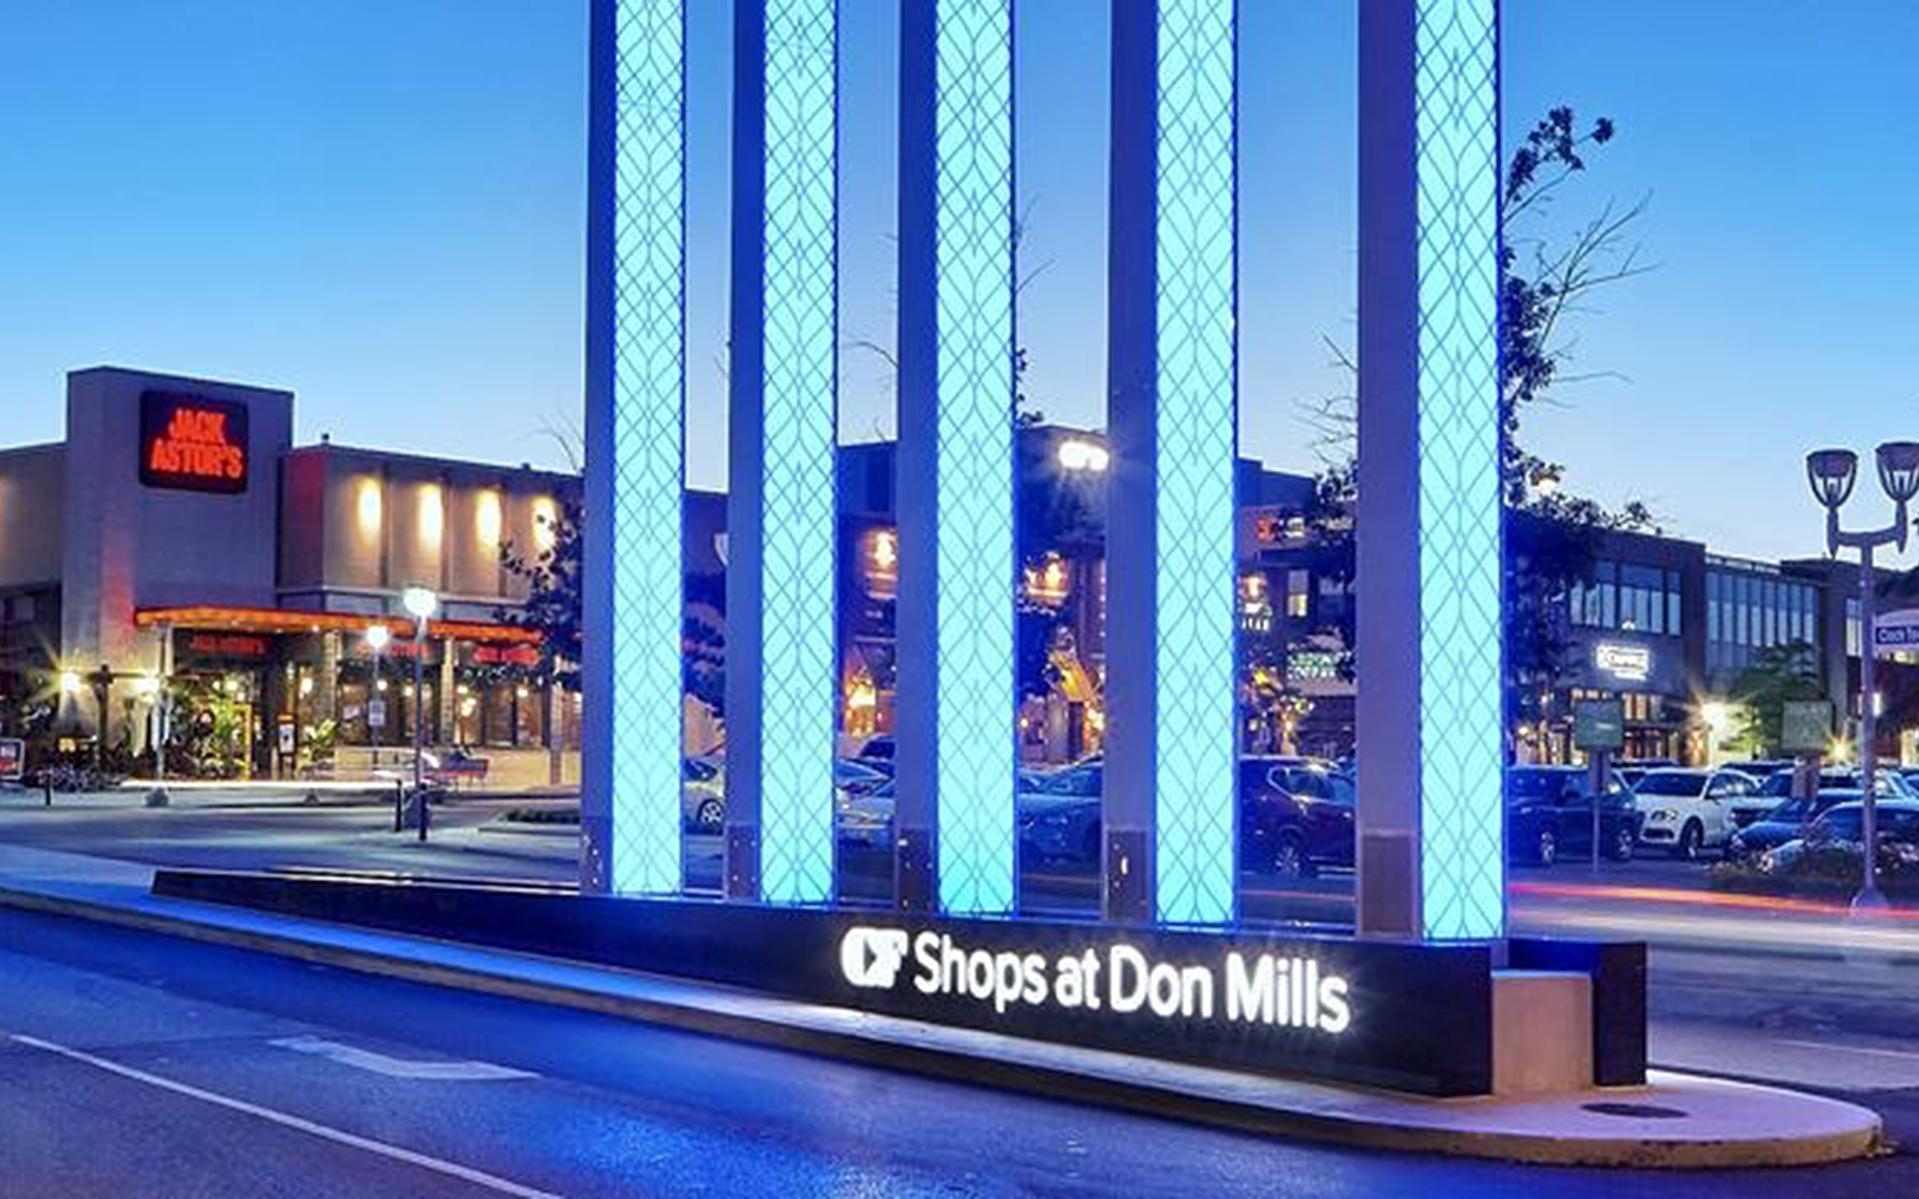 Shops at Don Mills at 708 - 85 The Donway Donway W, Banbury-Don Mills, Toronto